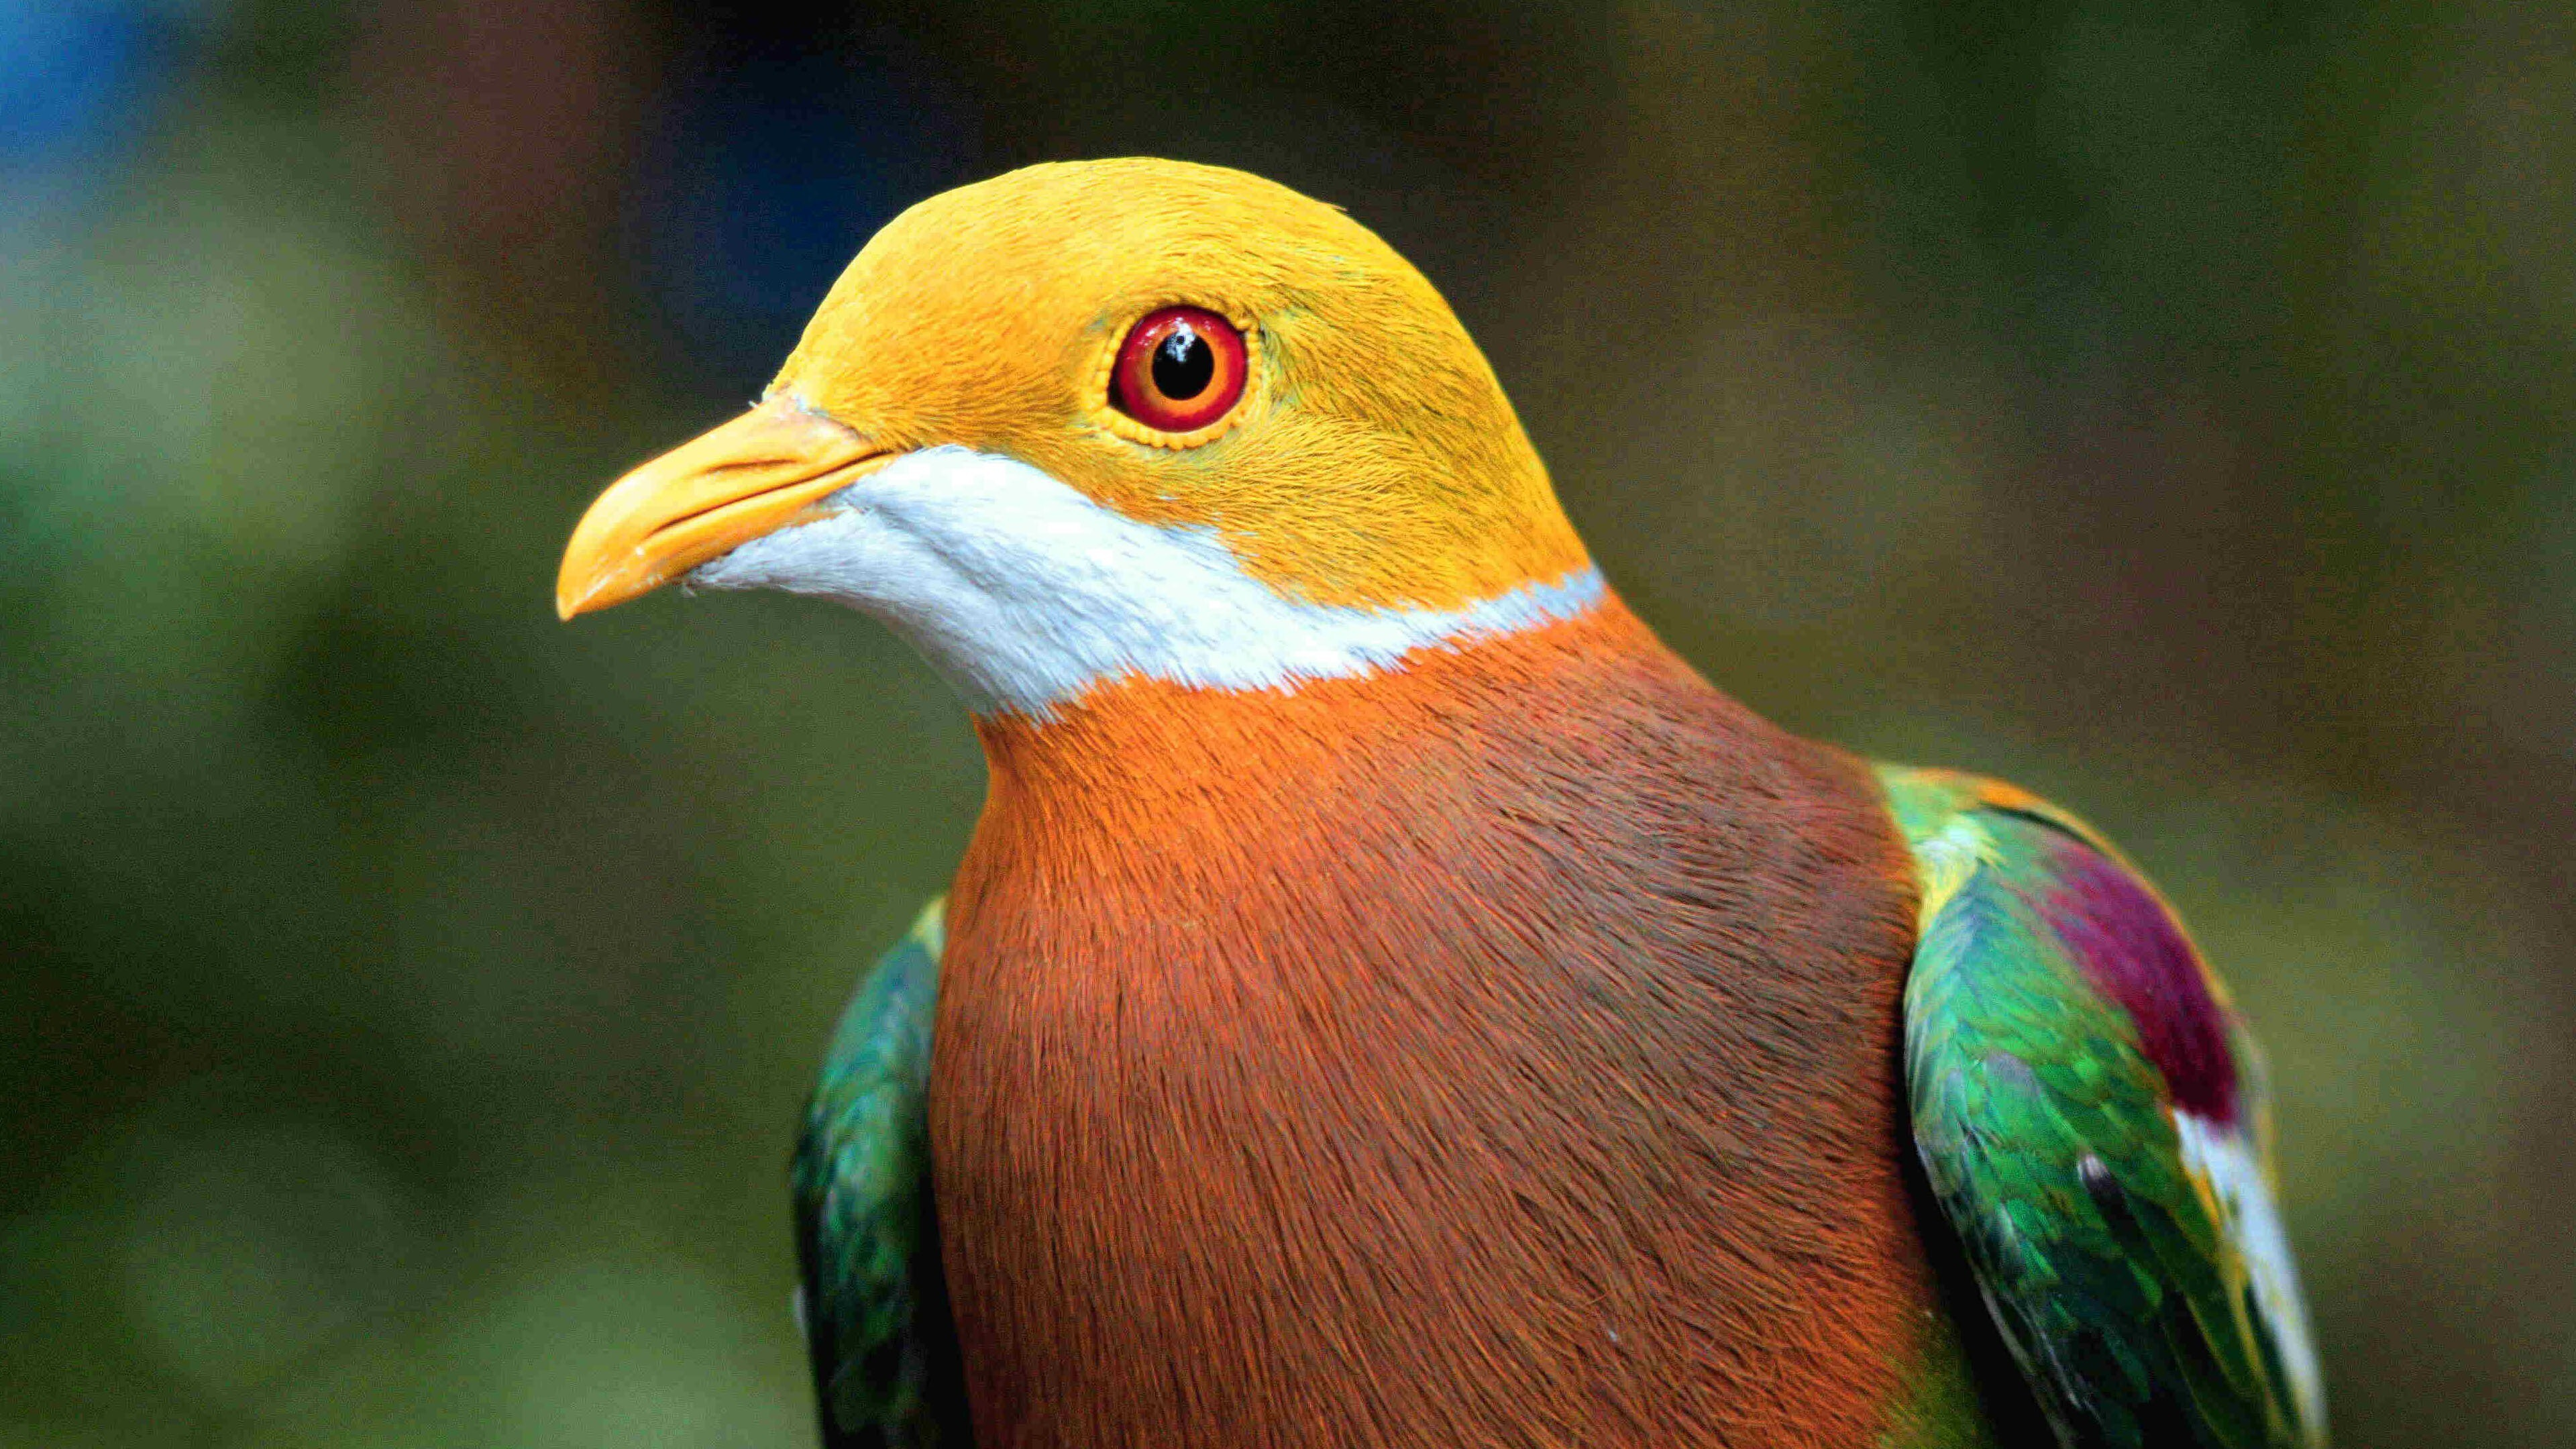 Colorful Bird Dove 4k Wallpaper Hd Wallpapers